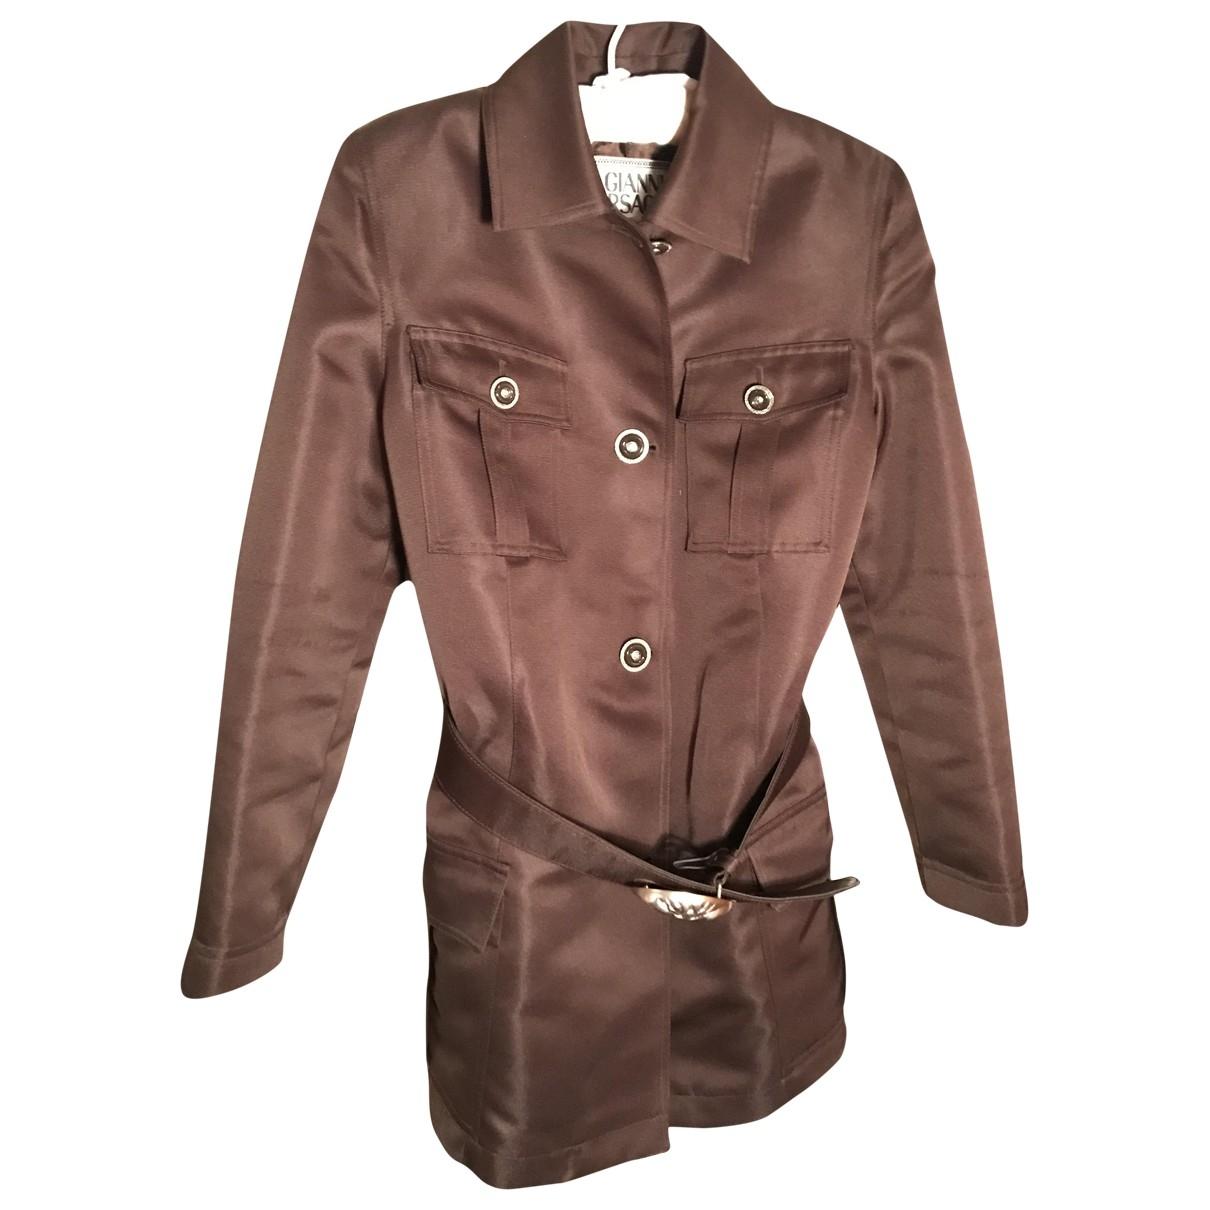 Gianni Versace \N Brown jacket for Women 42 IT